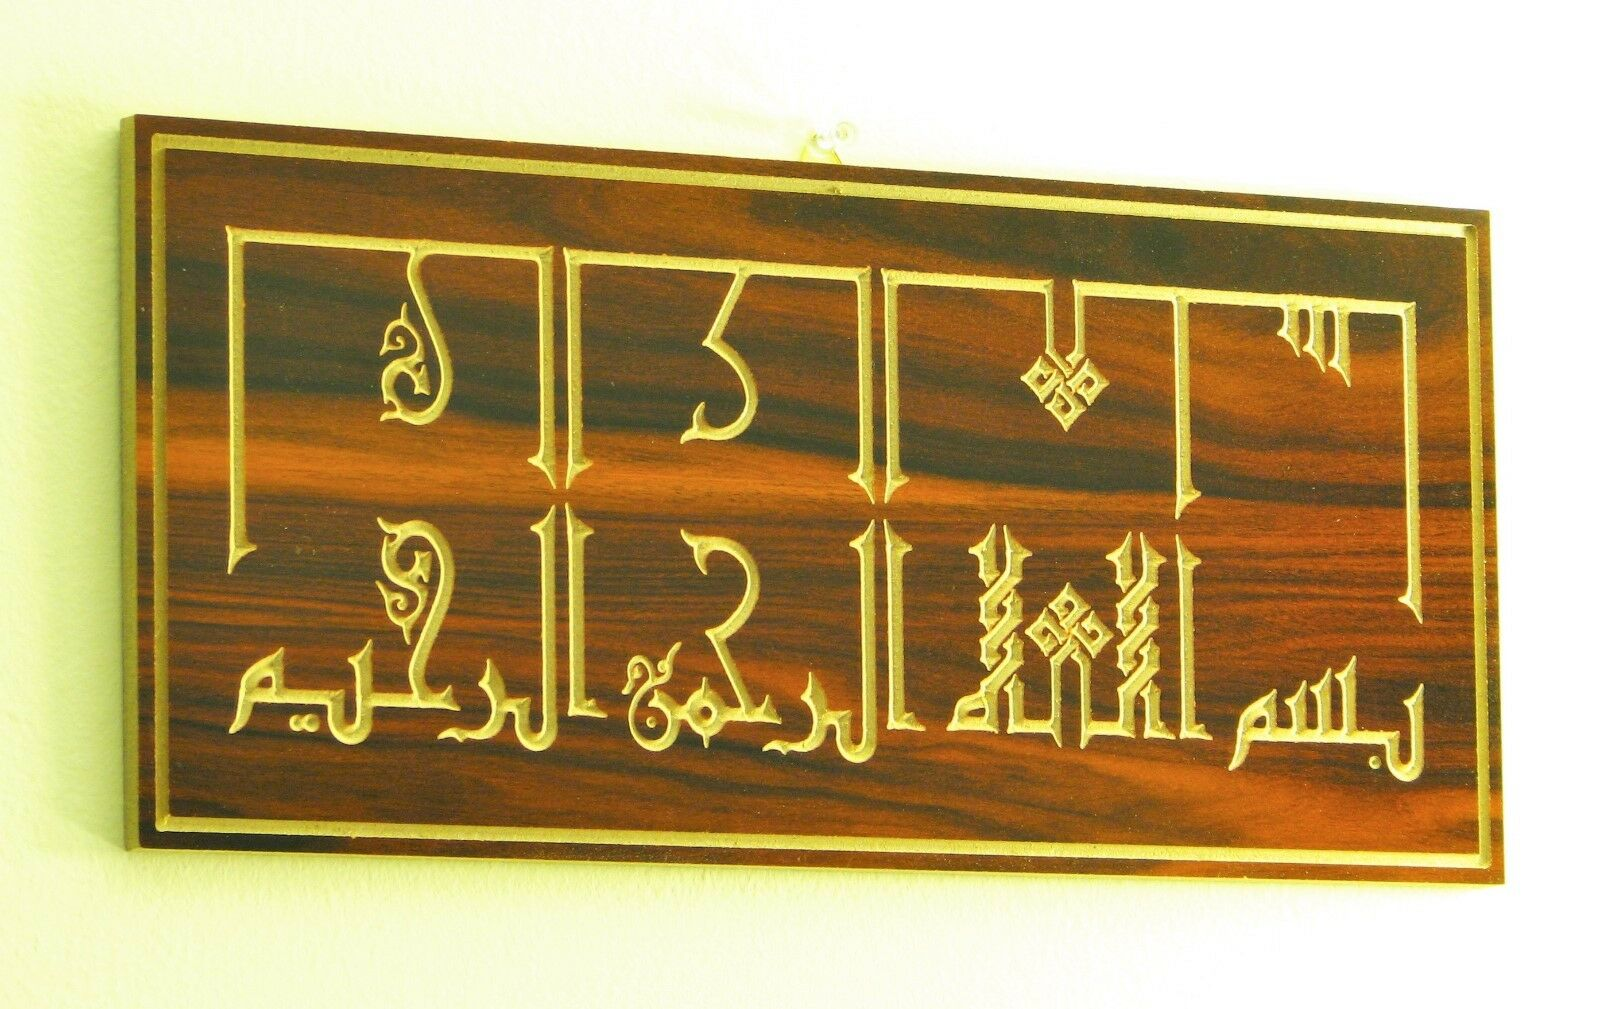 Islamic Wooden Carving Art Wall Decor Decals Arabic Quran ...